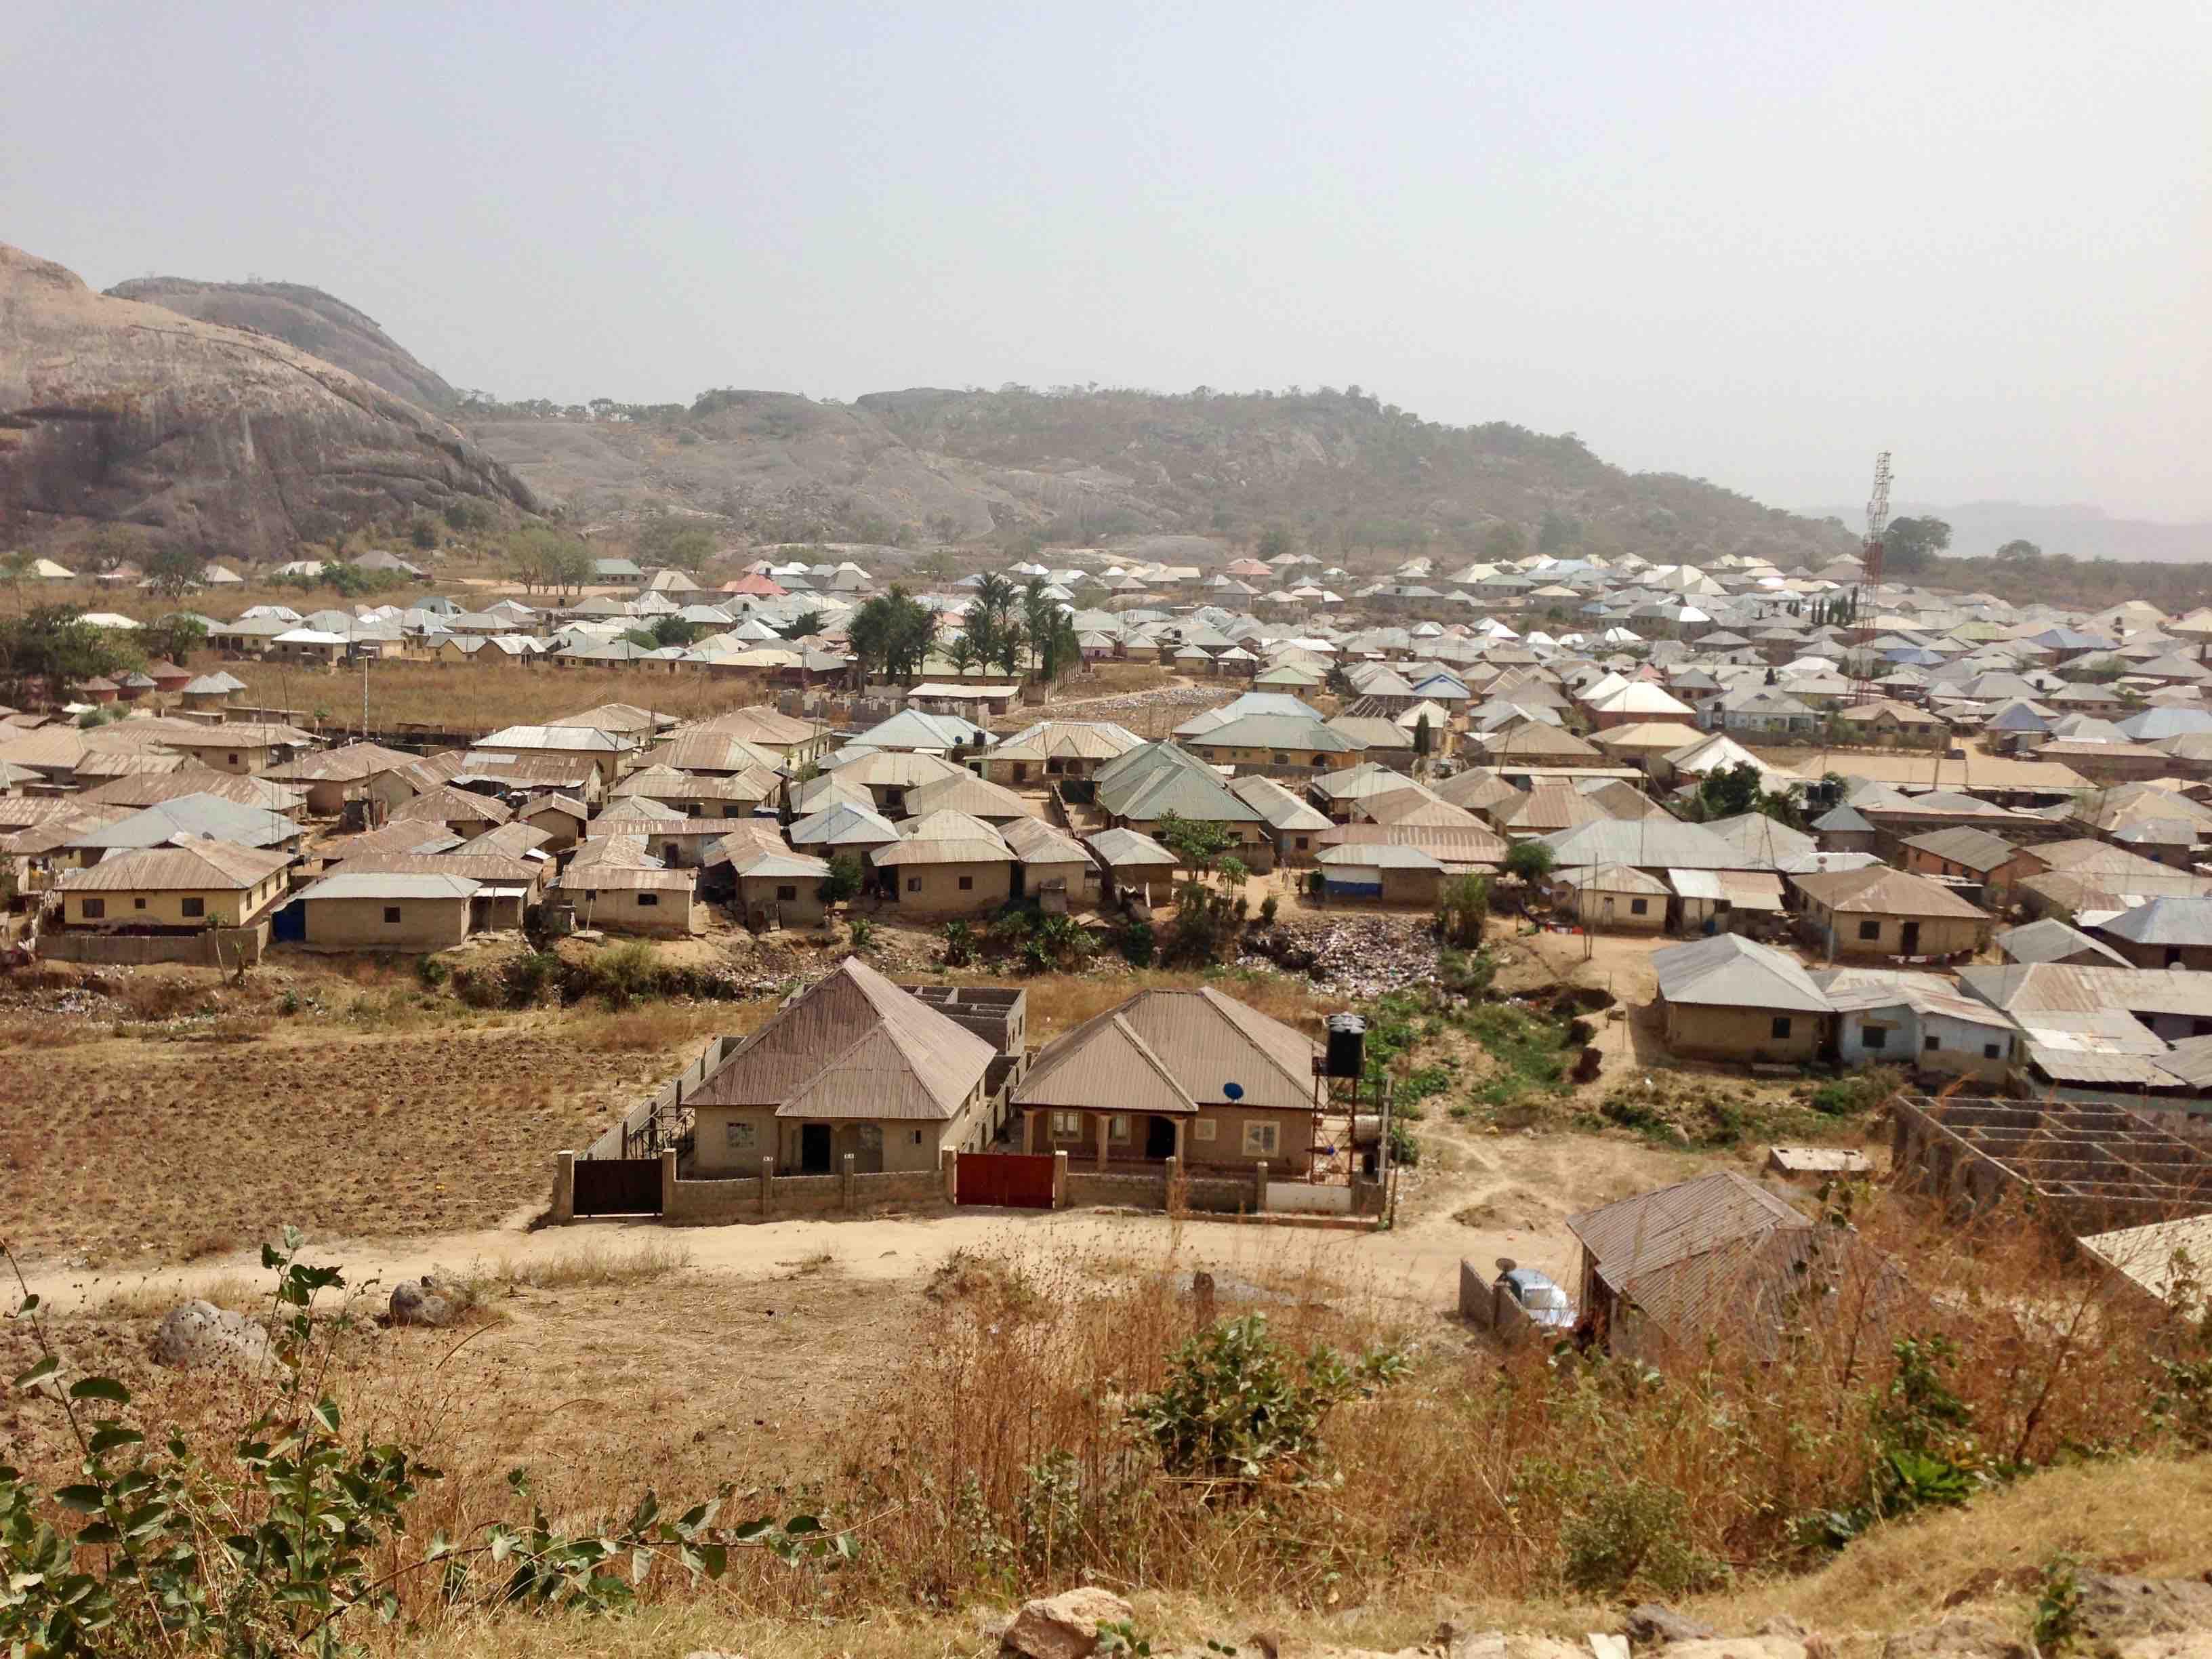 Ushafa Village, FCT, Abuja, Nigeria. #JujuFilms